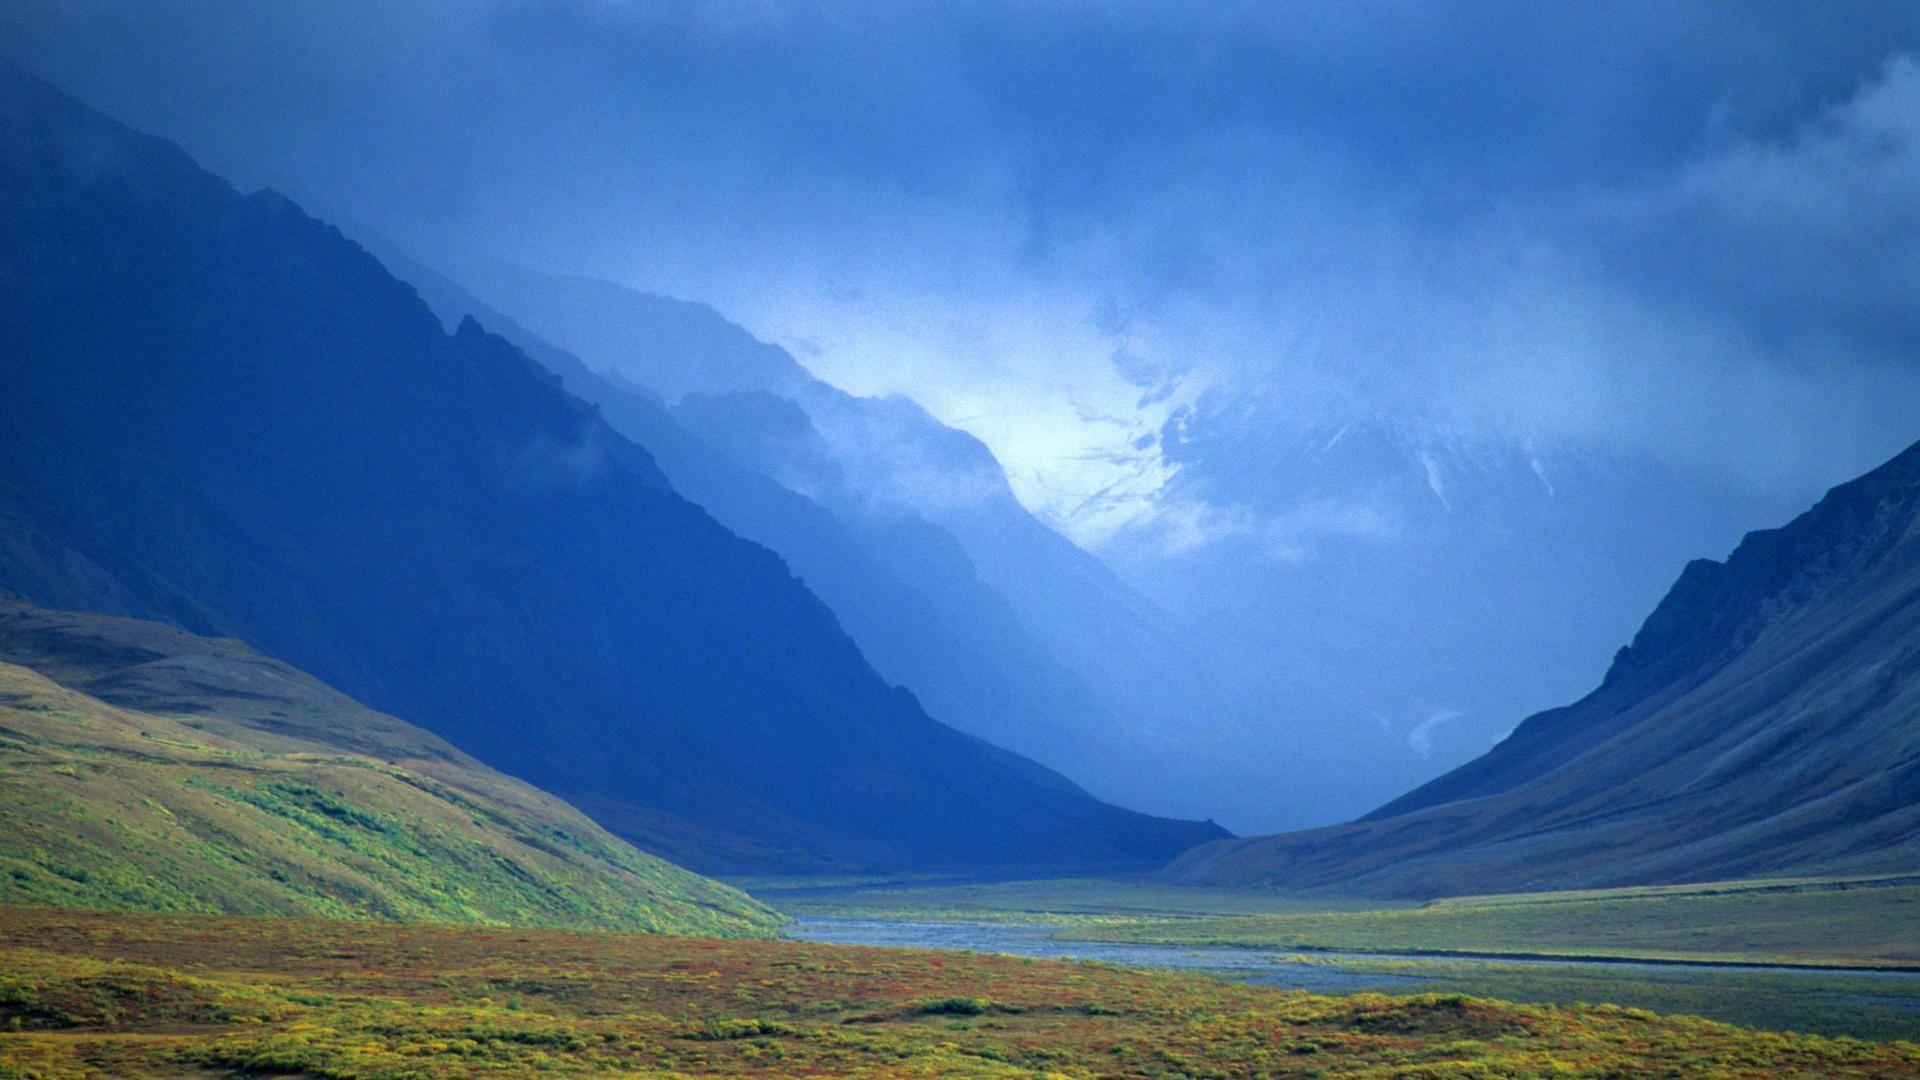 epic nature wallpaper - photo #44